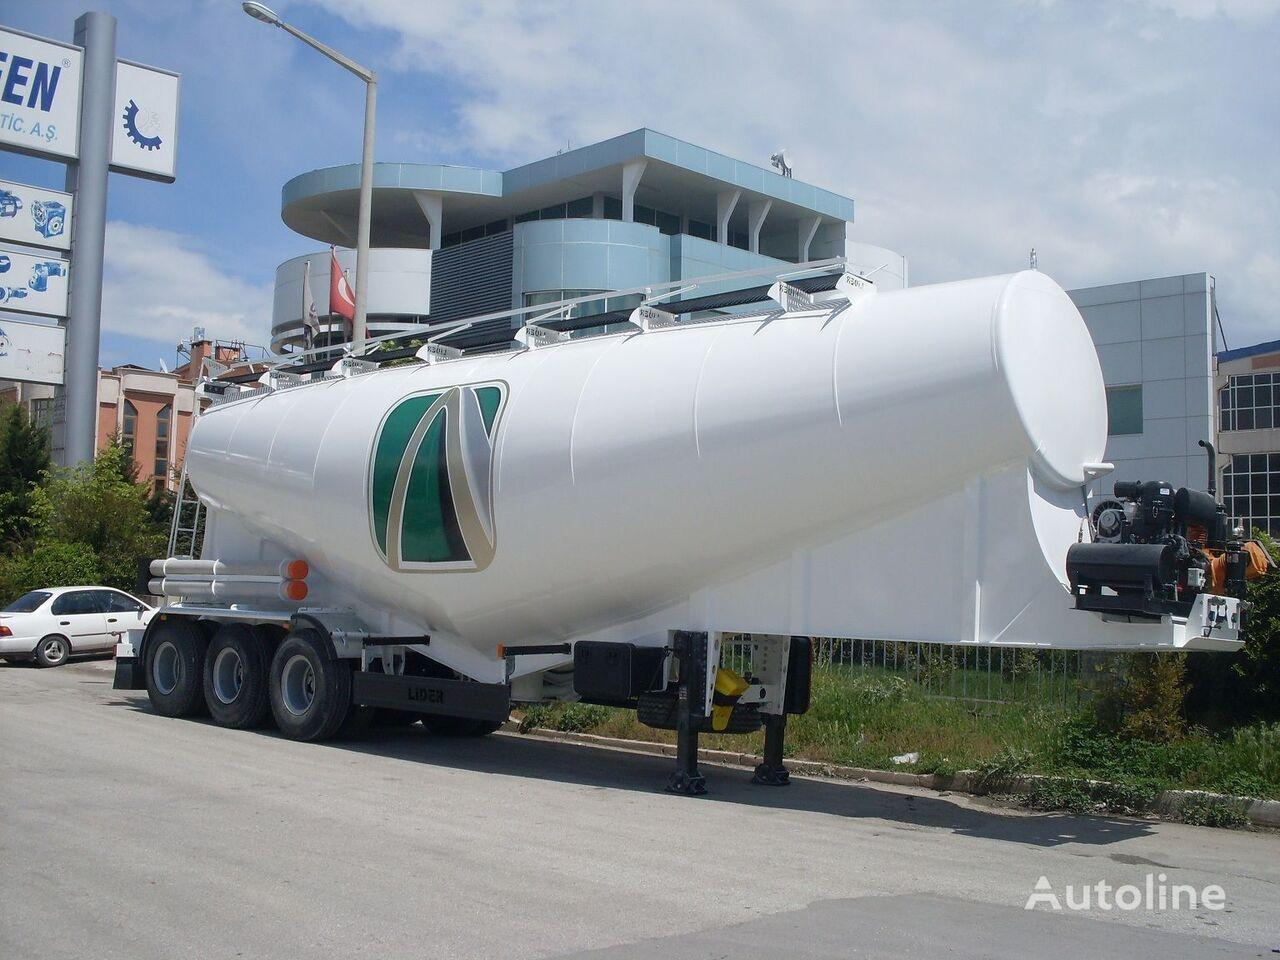 nieuw LIDER بلكر اسمنت مواصفات اوربية 2017 cement tank